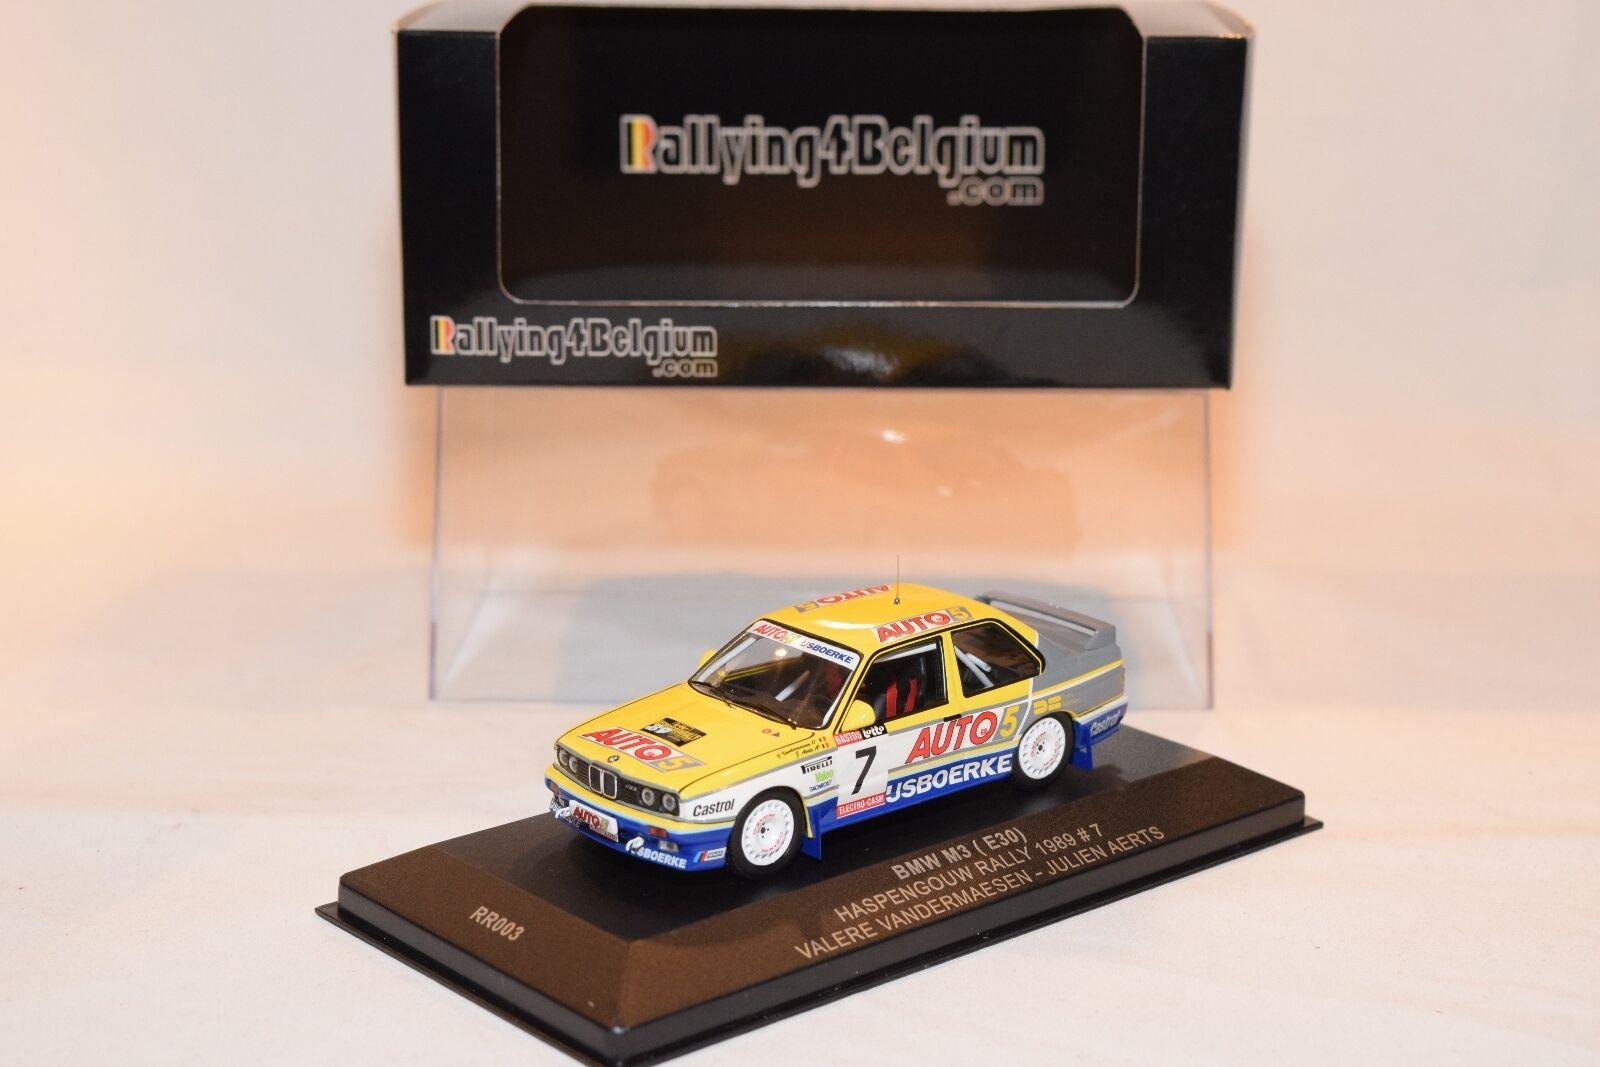 RALLYING4BELGIUM RR003 BMW M3 E30 HASPENGOUW RALLY 1989 AERTS VANDERMAESEN